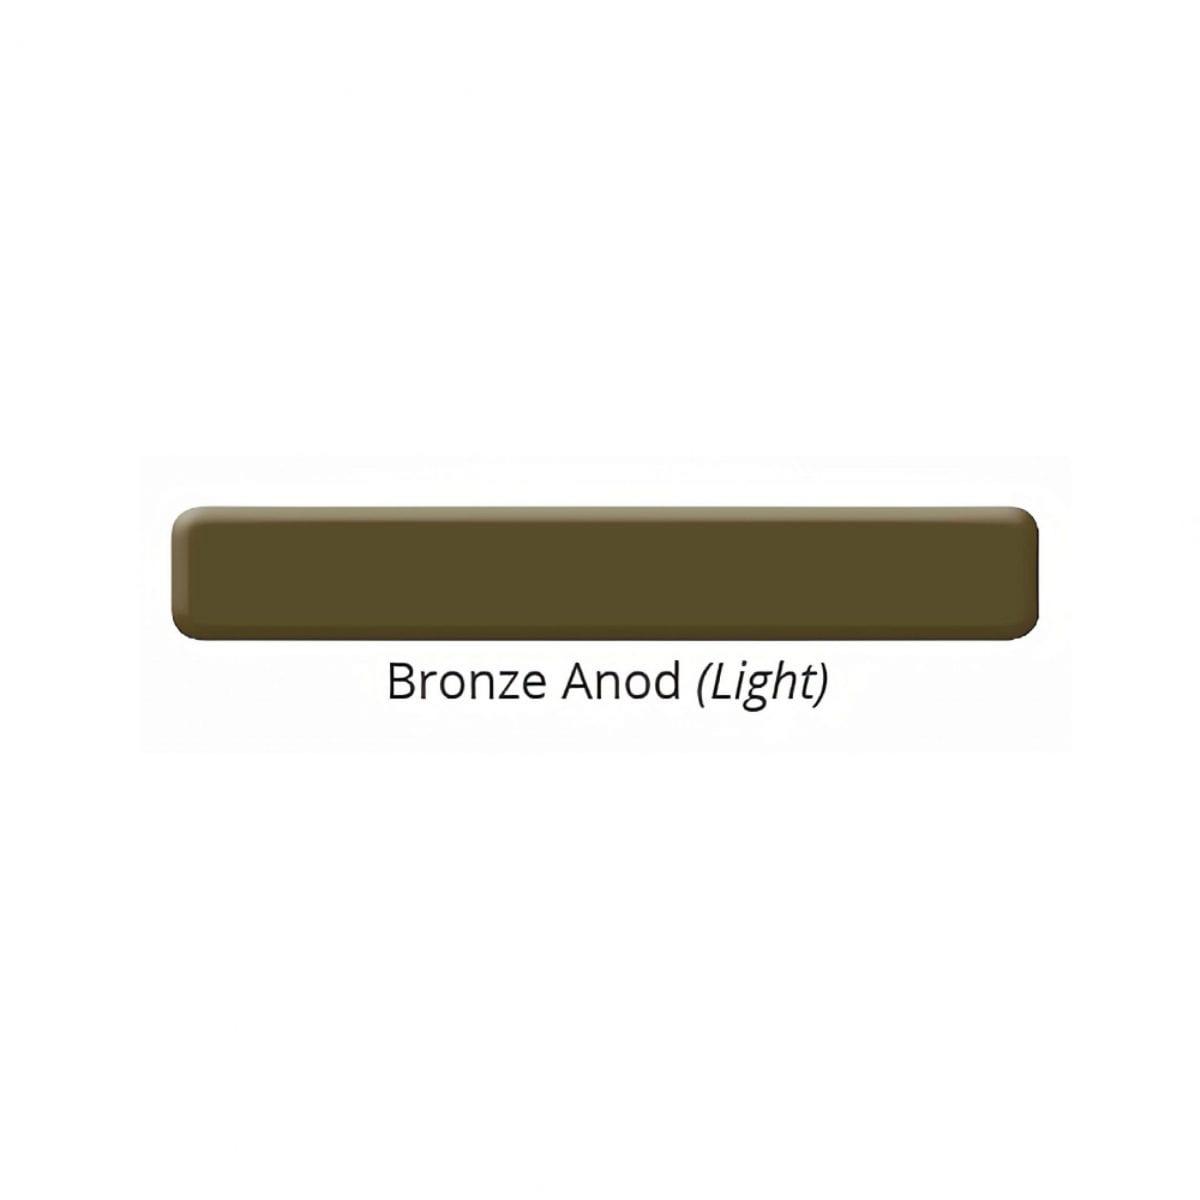 Bronze Anode (Light) color